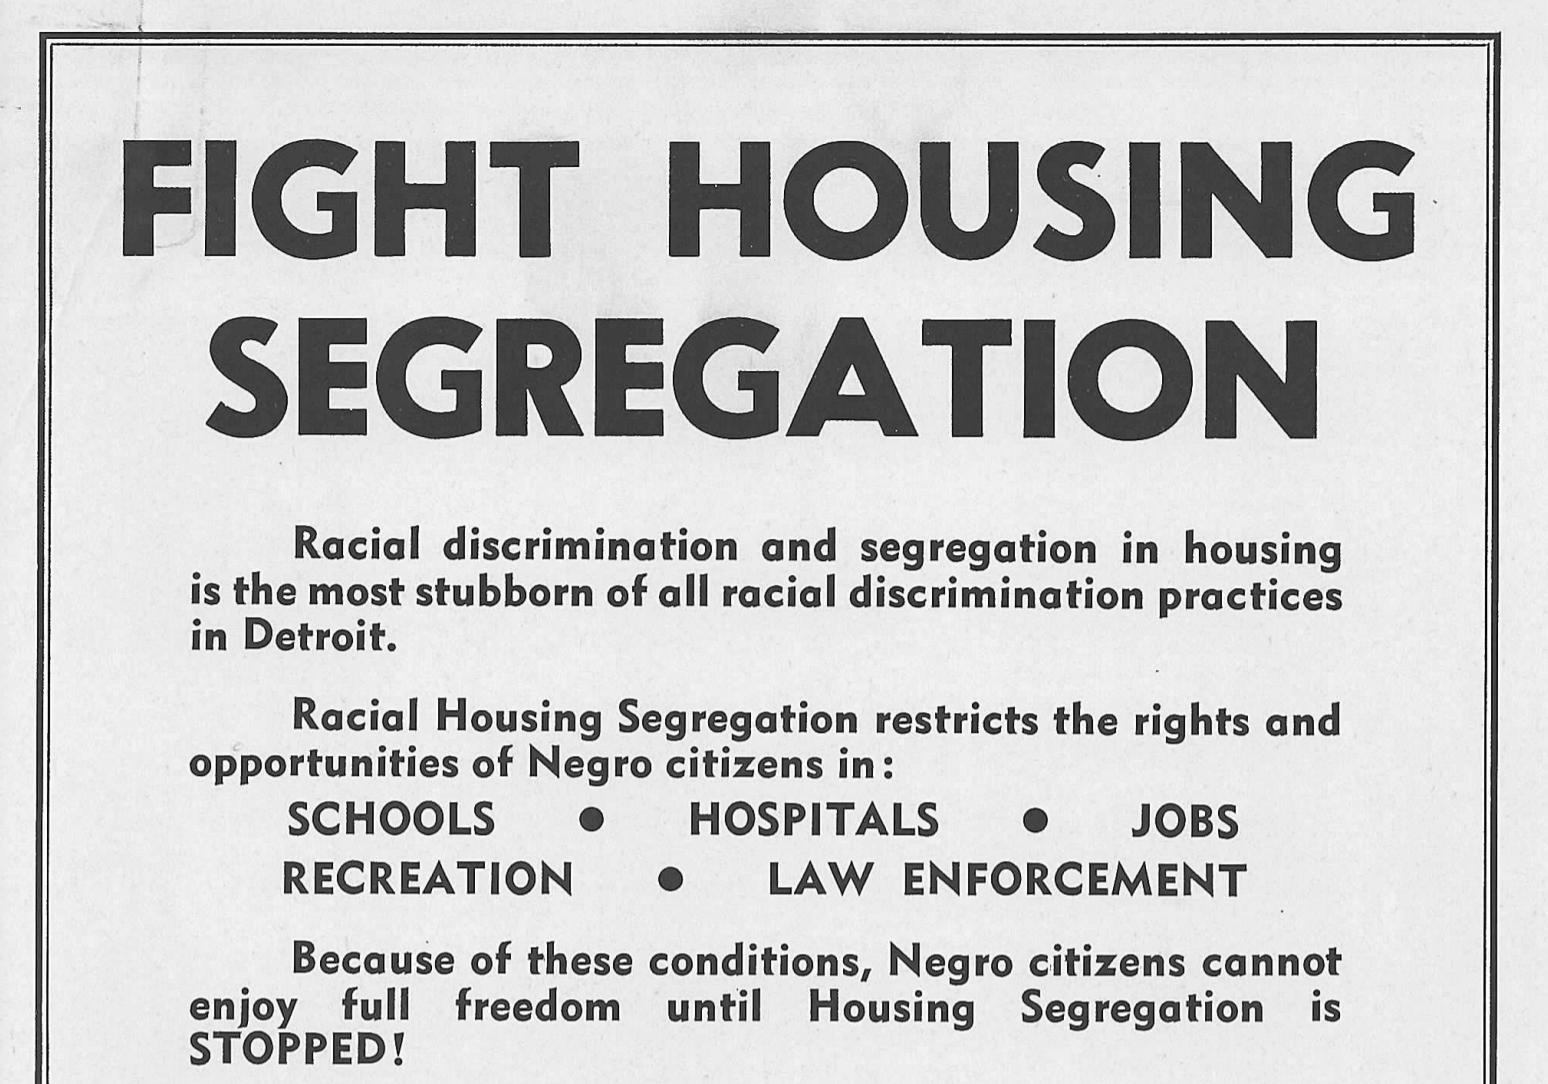 Fight Housing Segregation